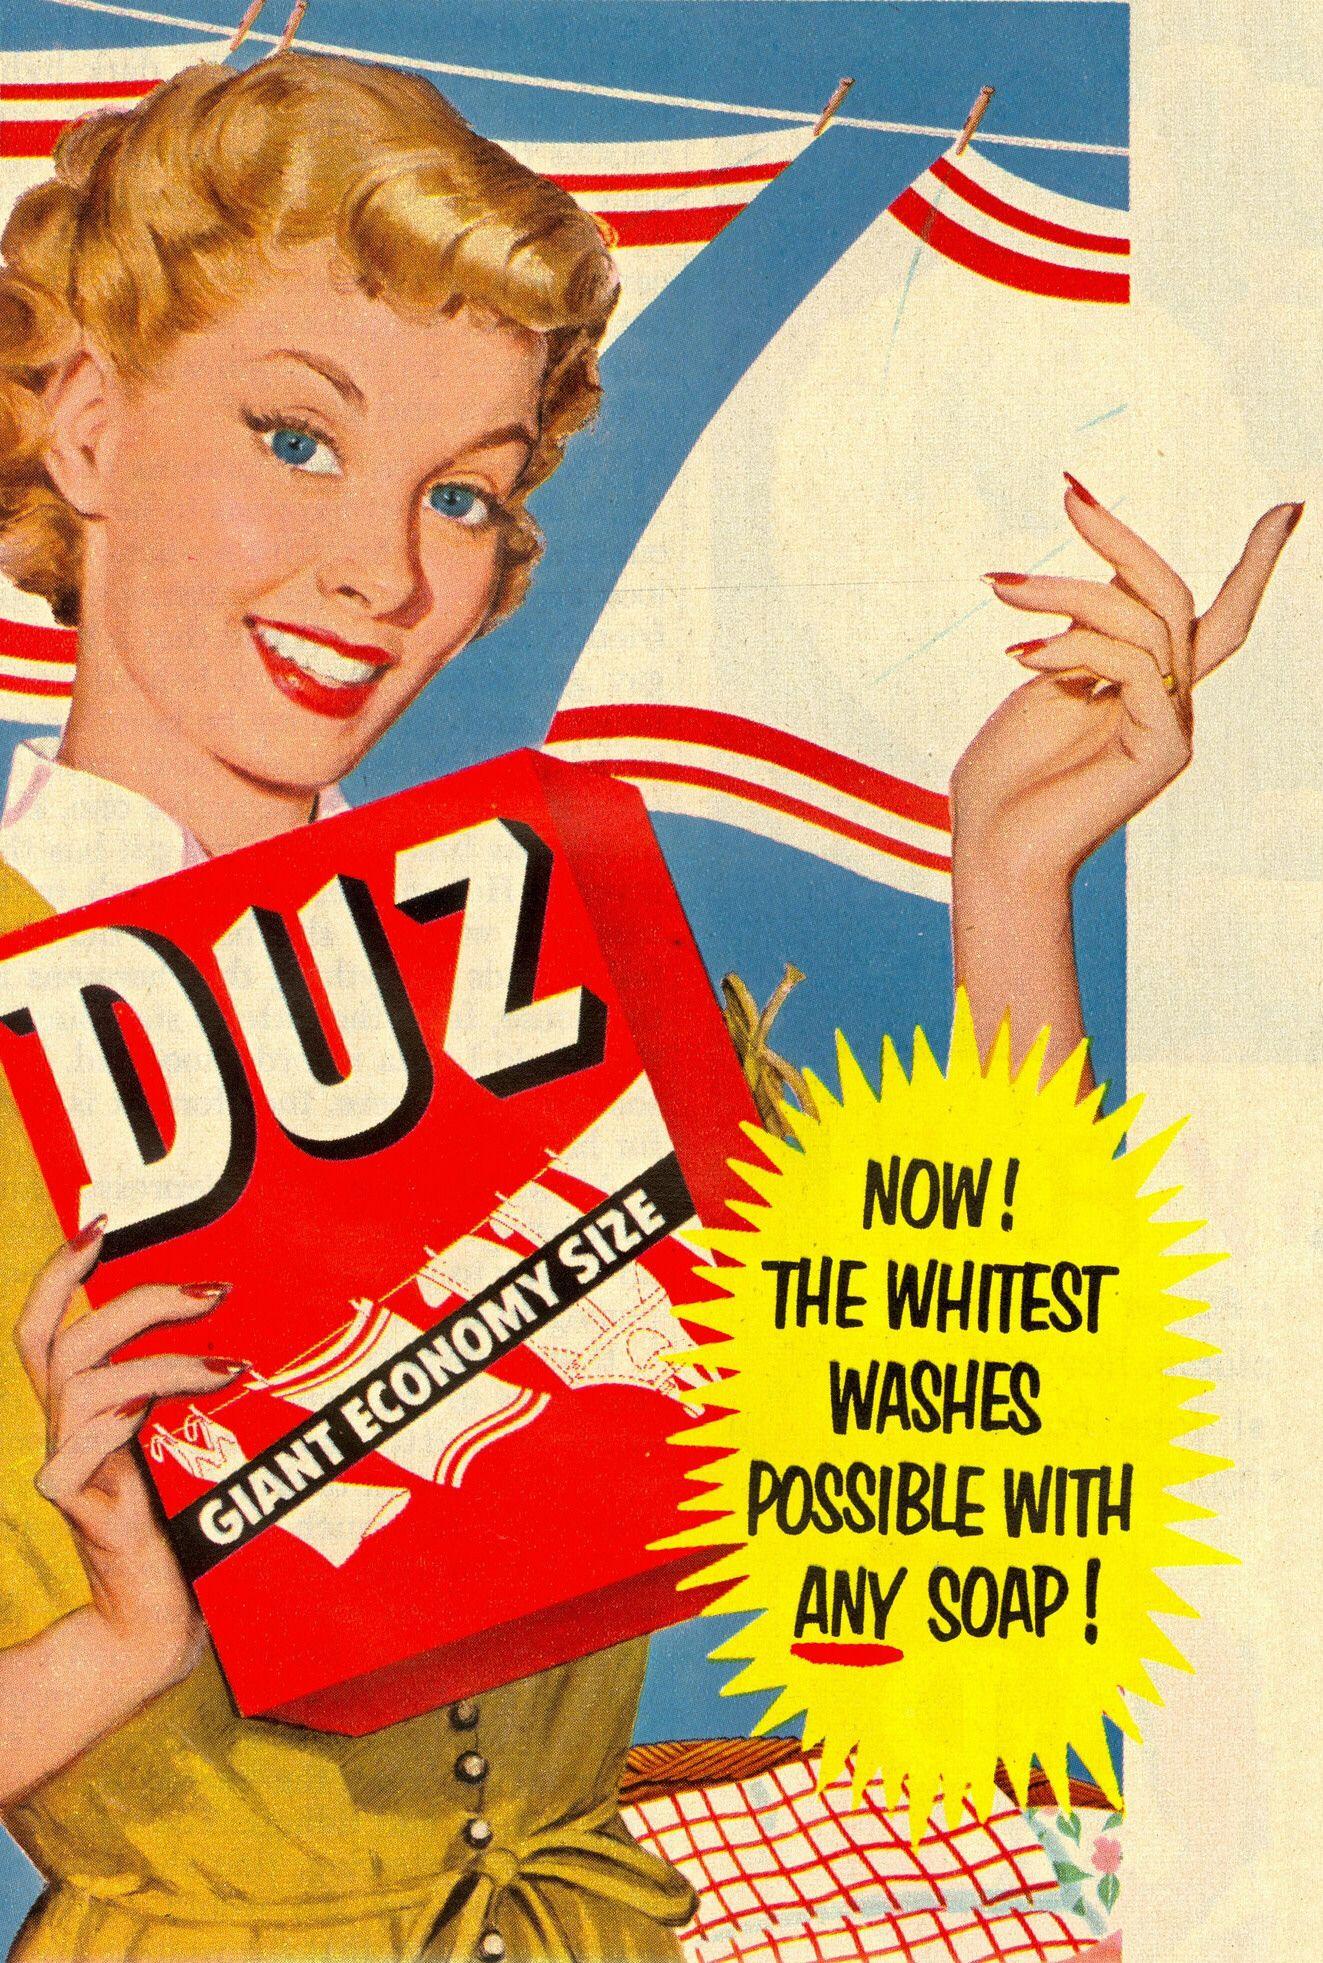 Duz Laundry Detergent Ad Vintage Ads Old Advertisements Vintage Advertisements